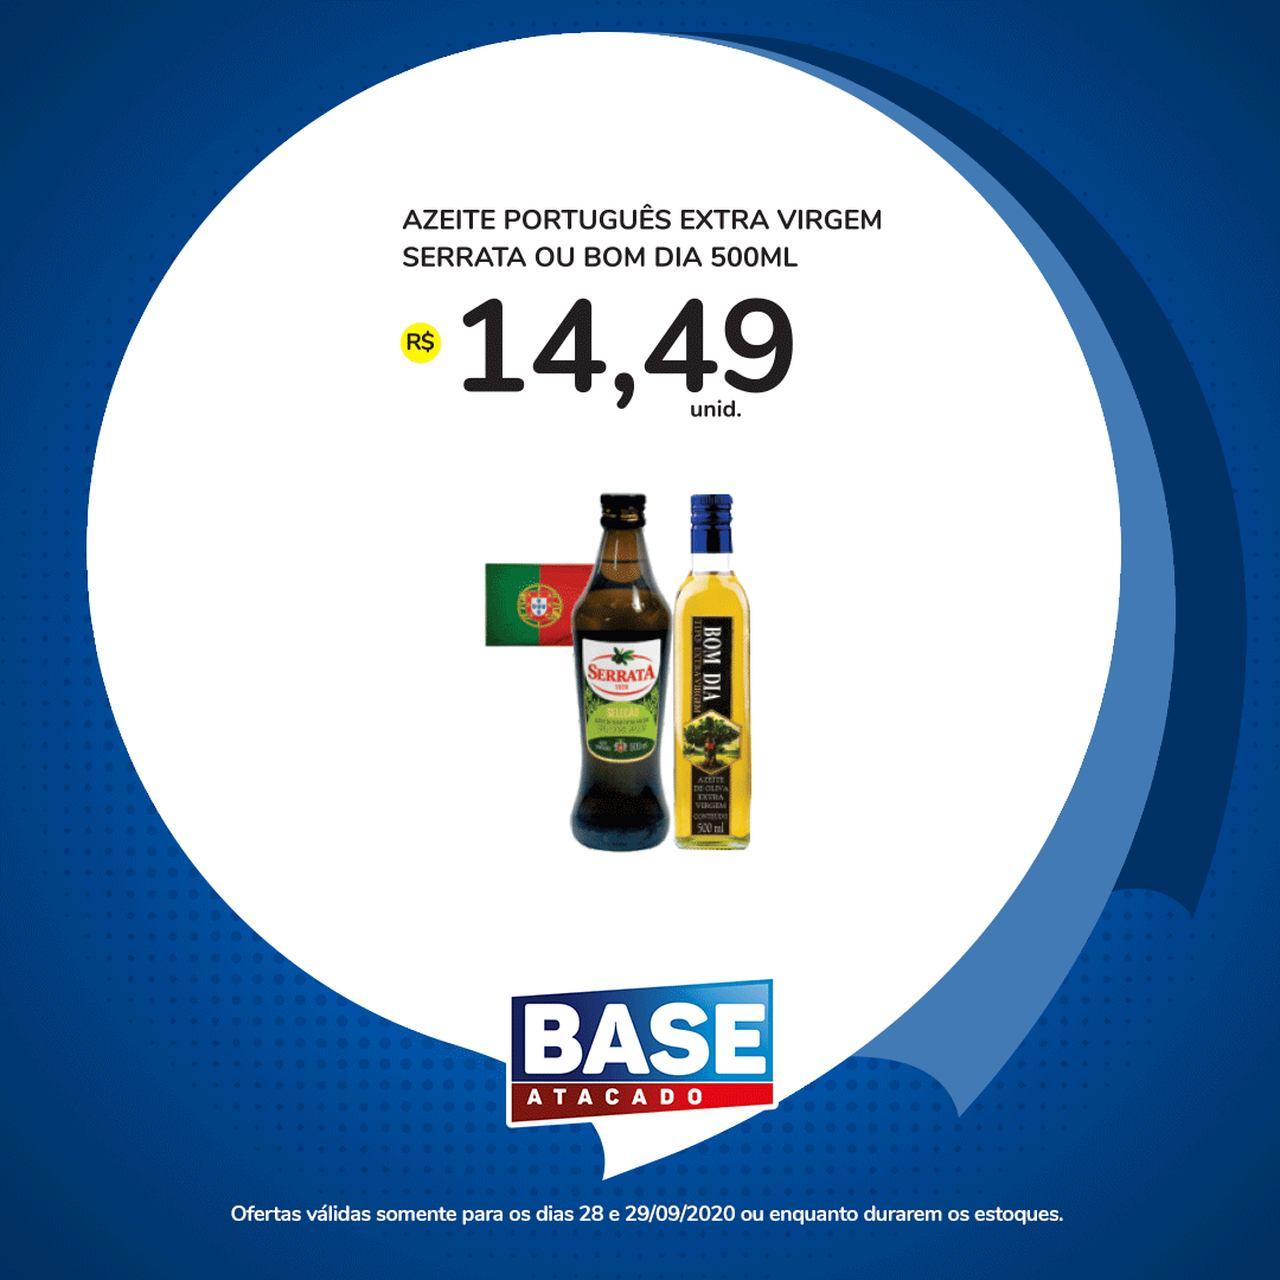 Ofertas de supermercado BASE atacado segunda e terça de super ofertas vence 29-09-5